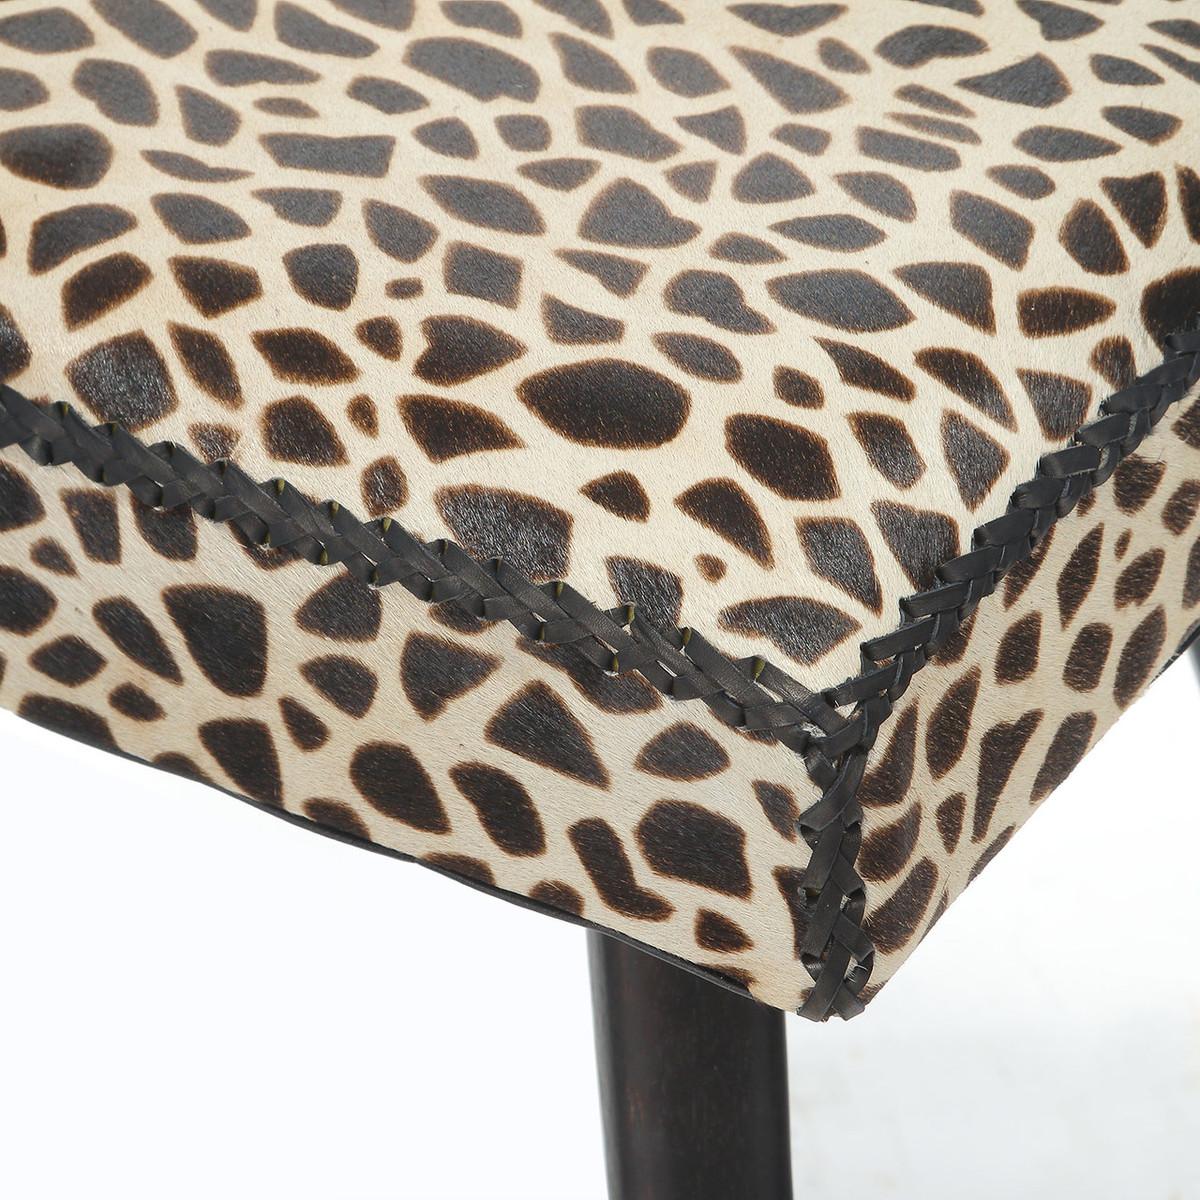 Swell Safari Cow Hide Mahogany Vanity Stool Leopard Print Cjindustries Chair Design For Home Cjindustriesco